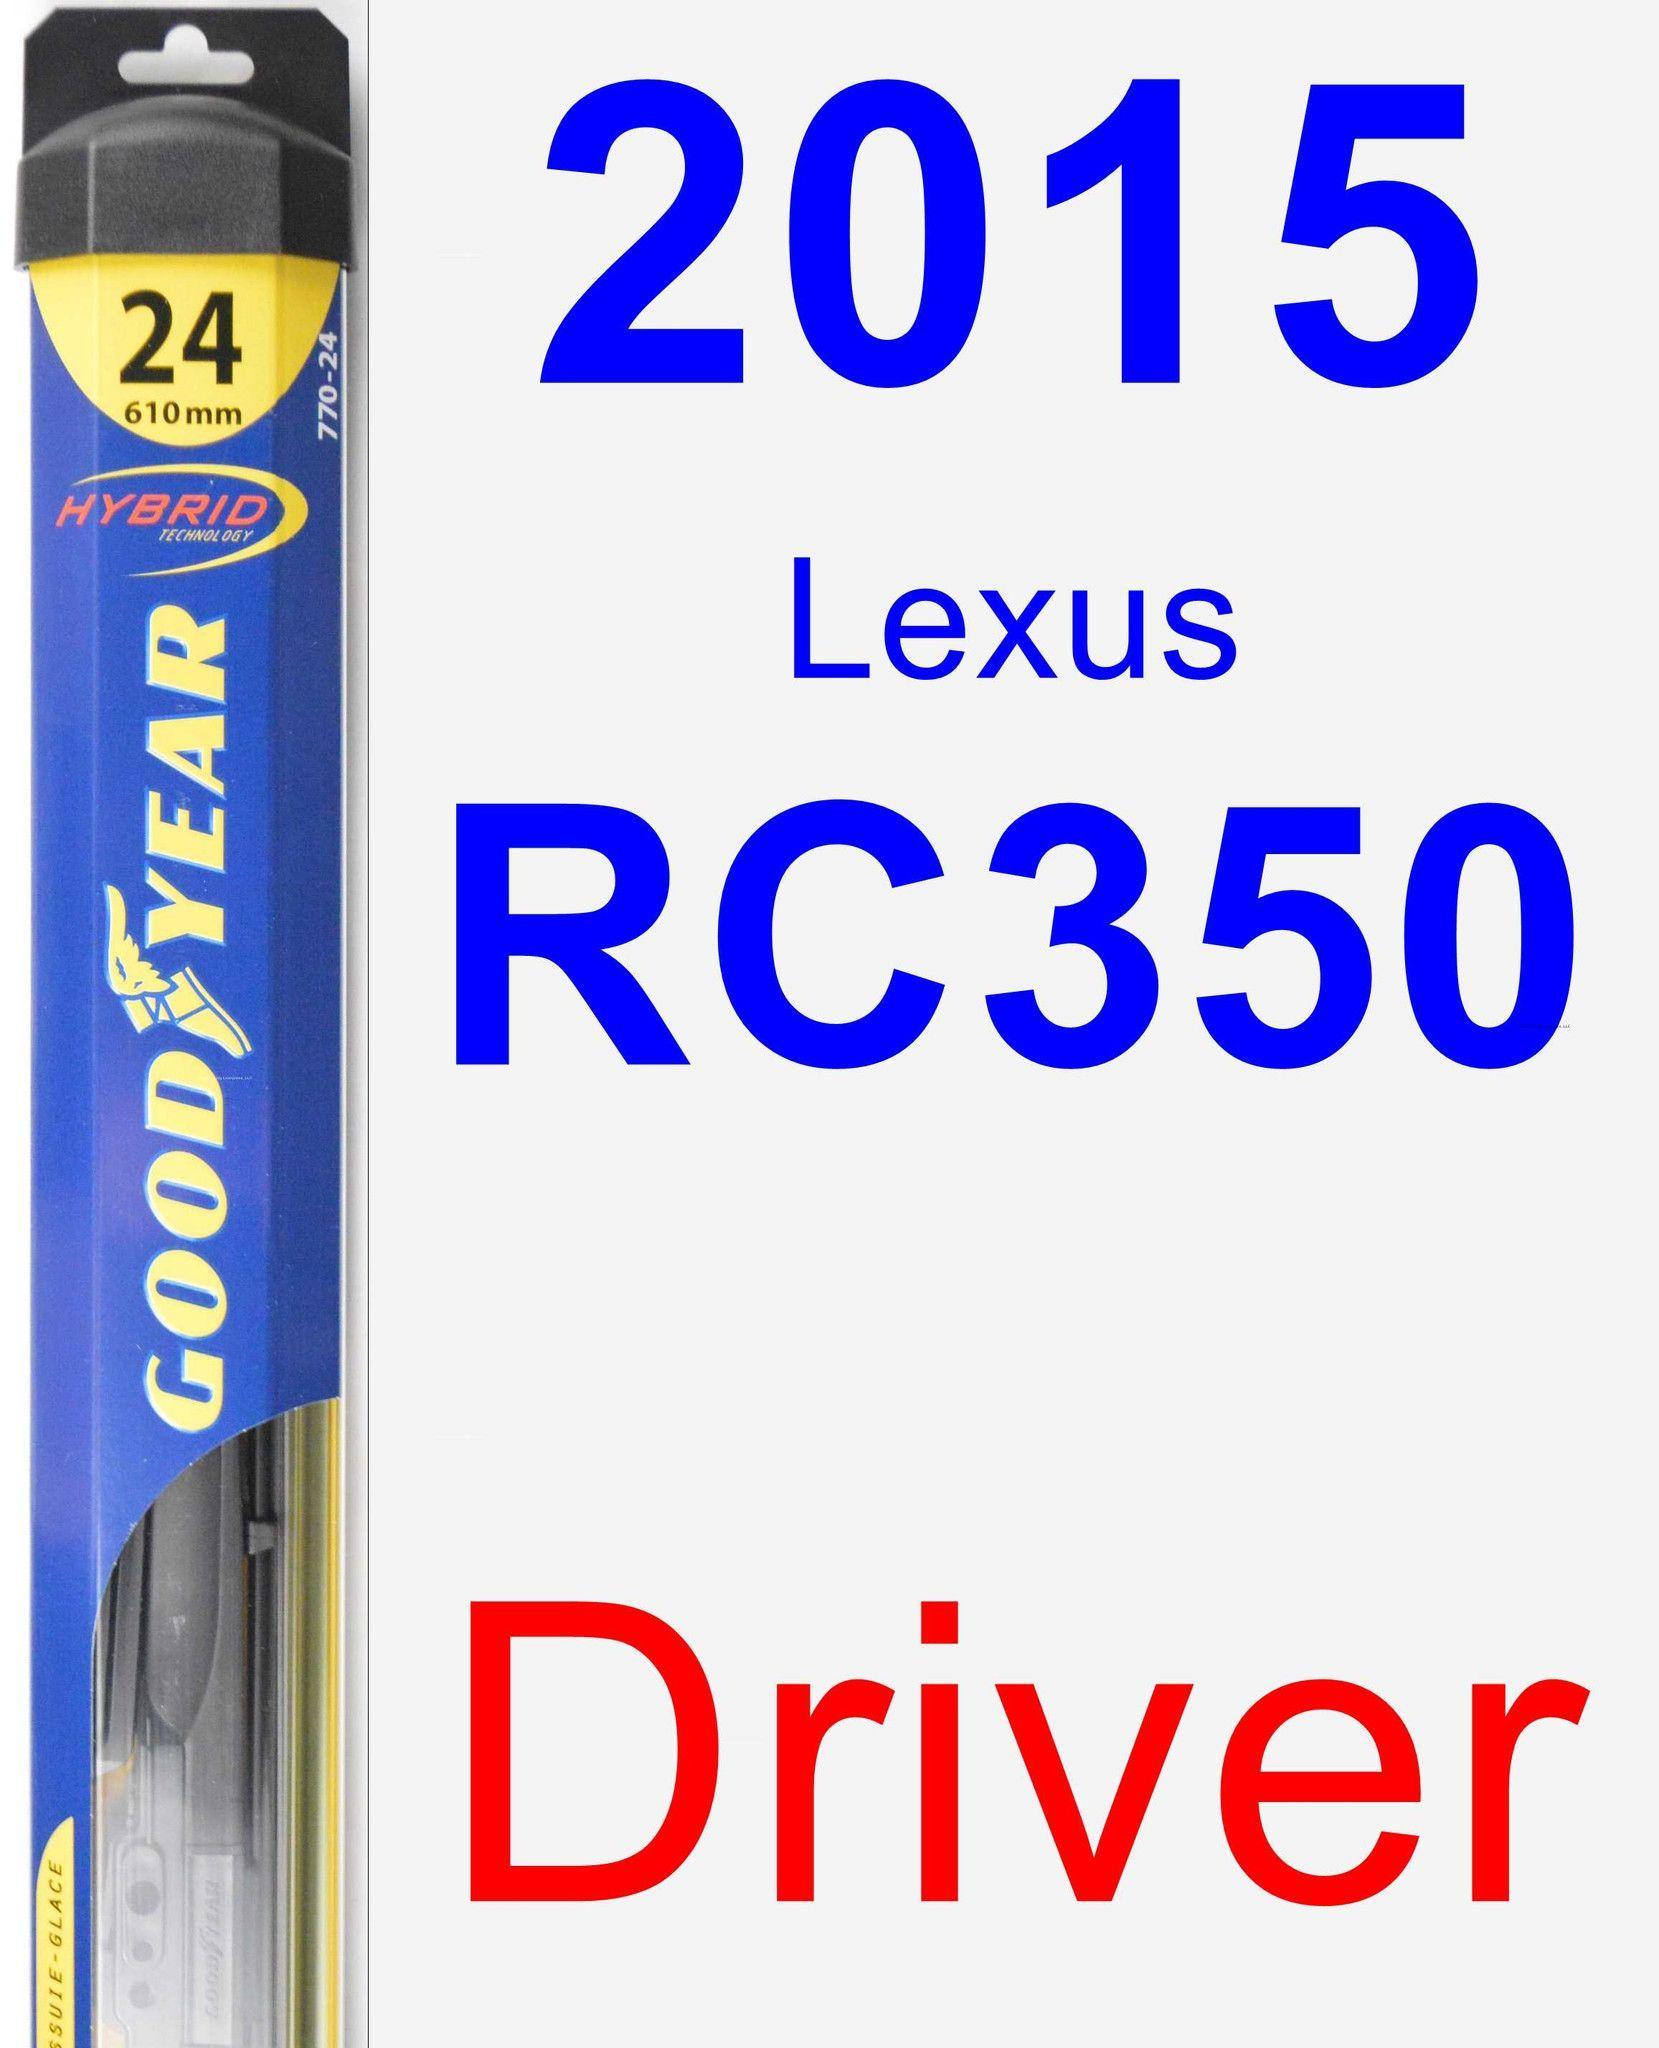 Driver Wiper Blade for 2015 Lexus RC350 - Hybrid